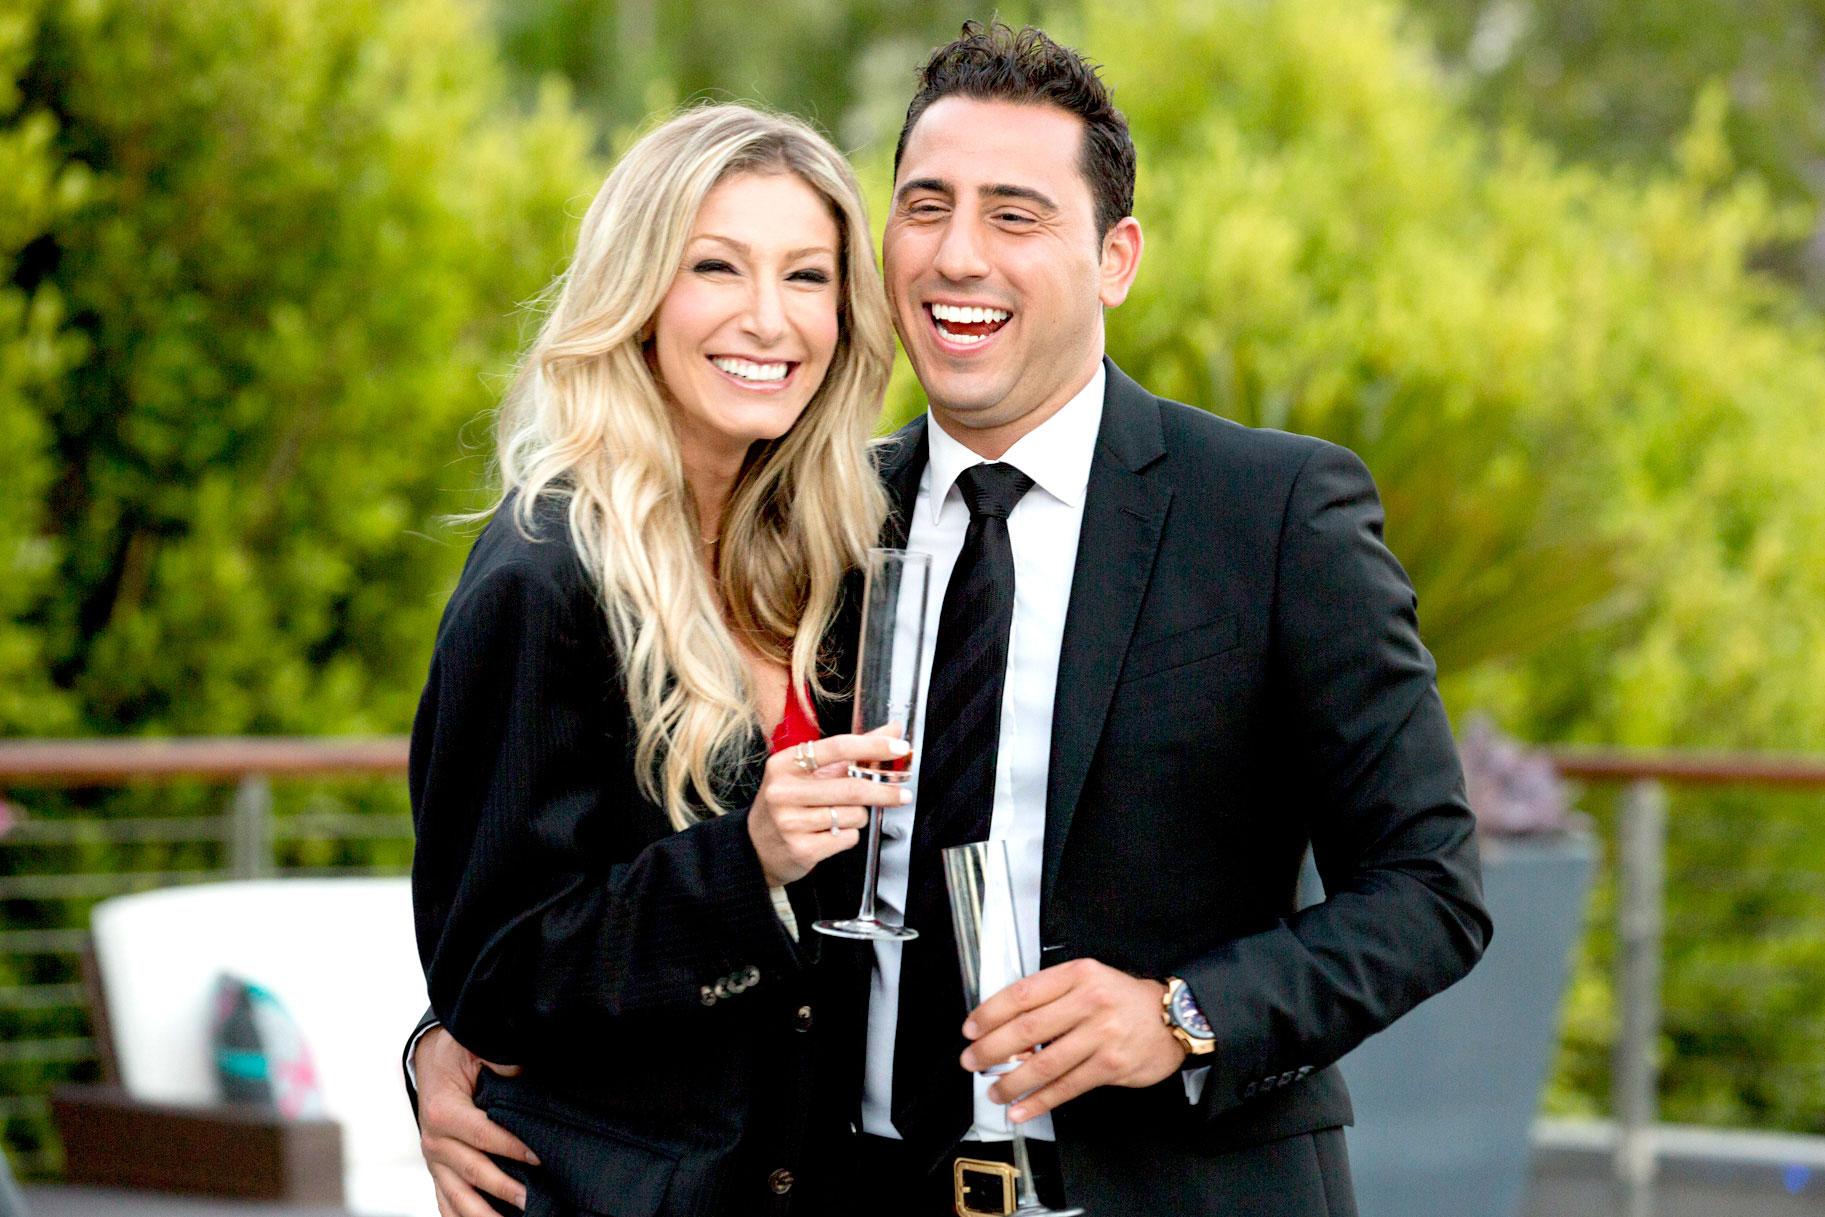 Josh altman and heather bilyeu dating